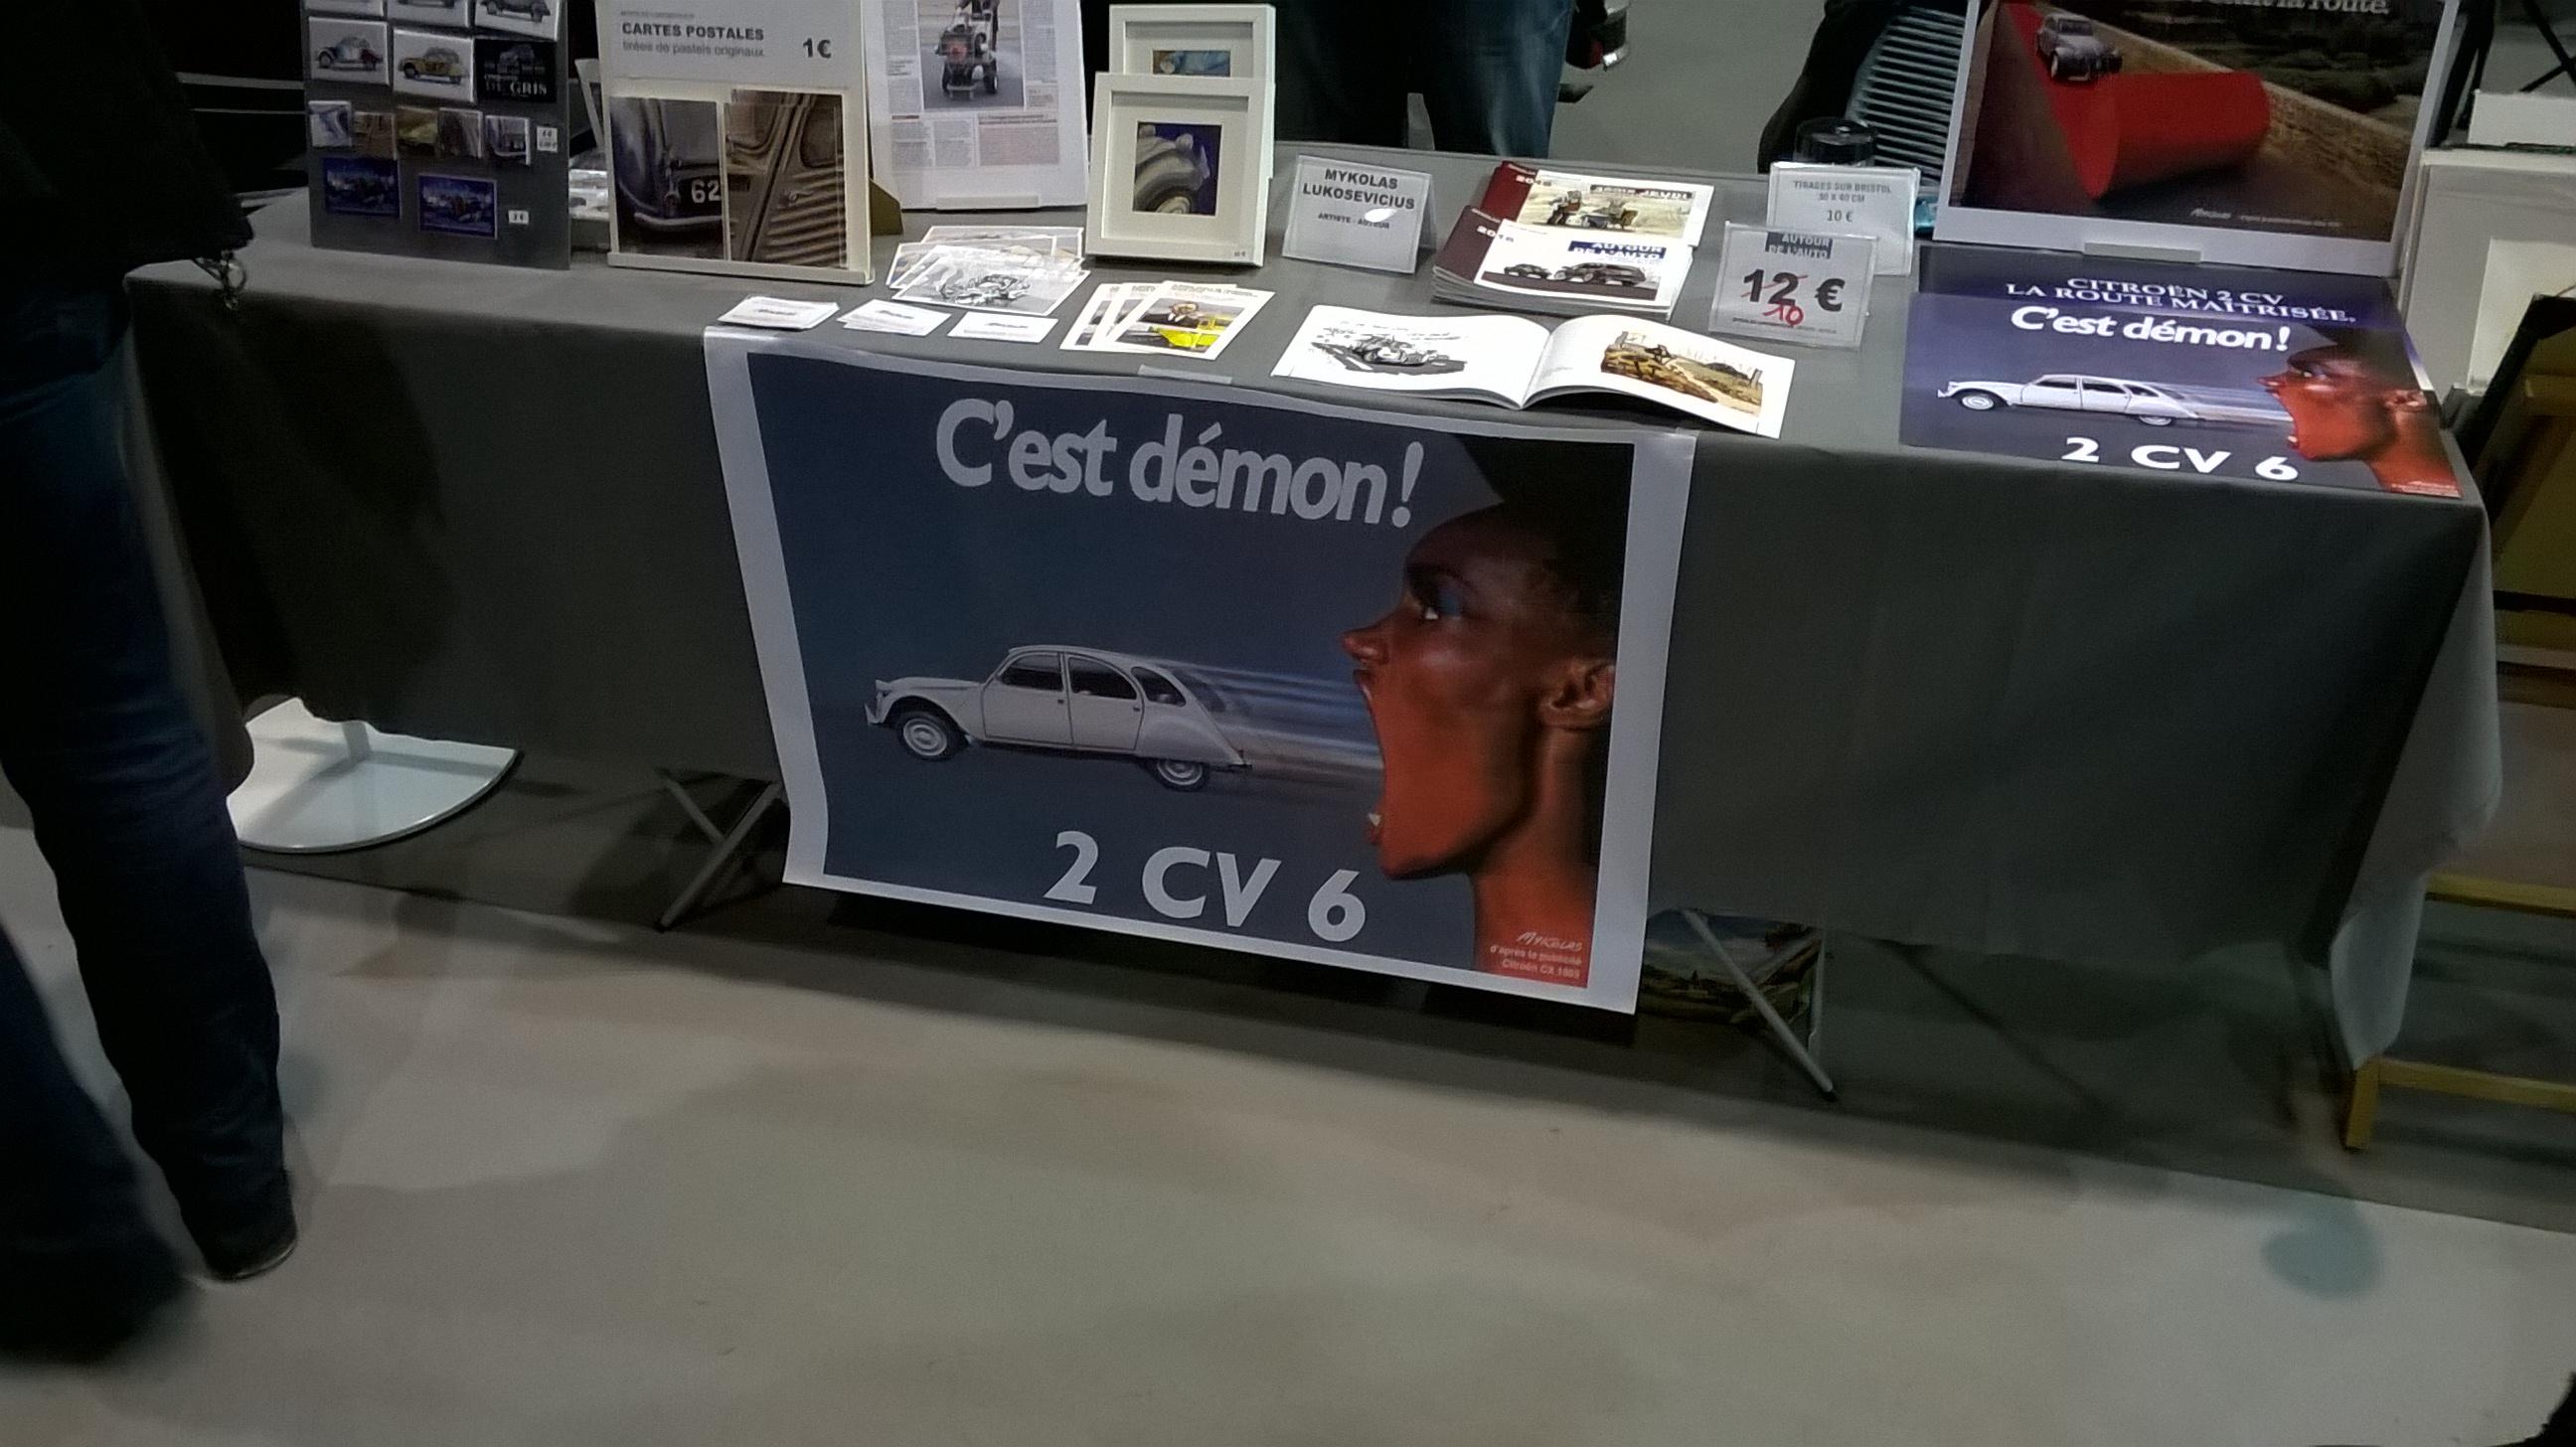 http://photosdyane.free.fr/uploads/1541875280.jpeg